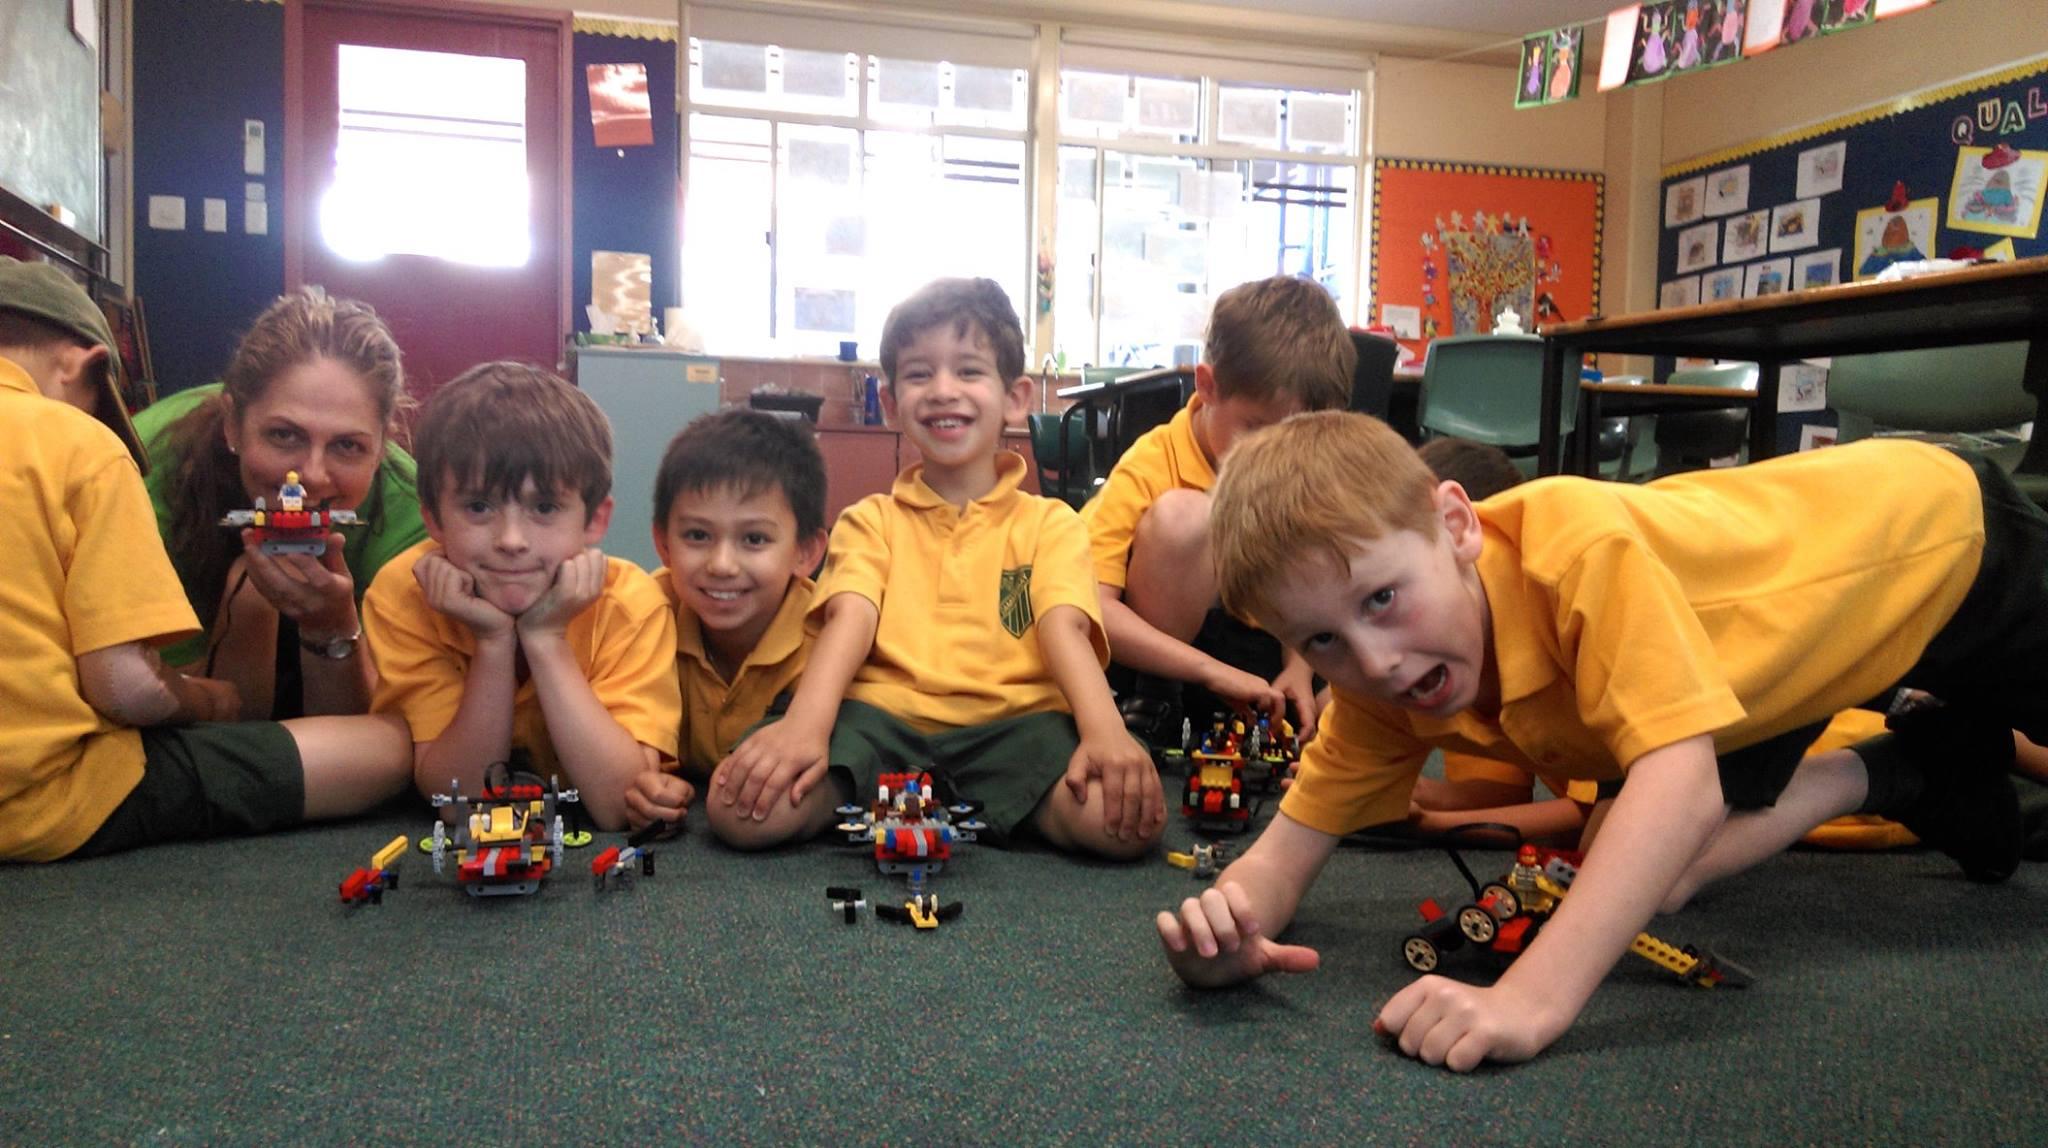 BRICKS 4 KIDZ Lower North Shore Sydney | After School Workshops with LEGO® Bricks 3